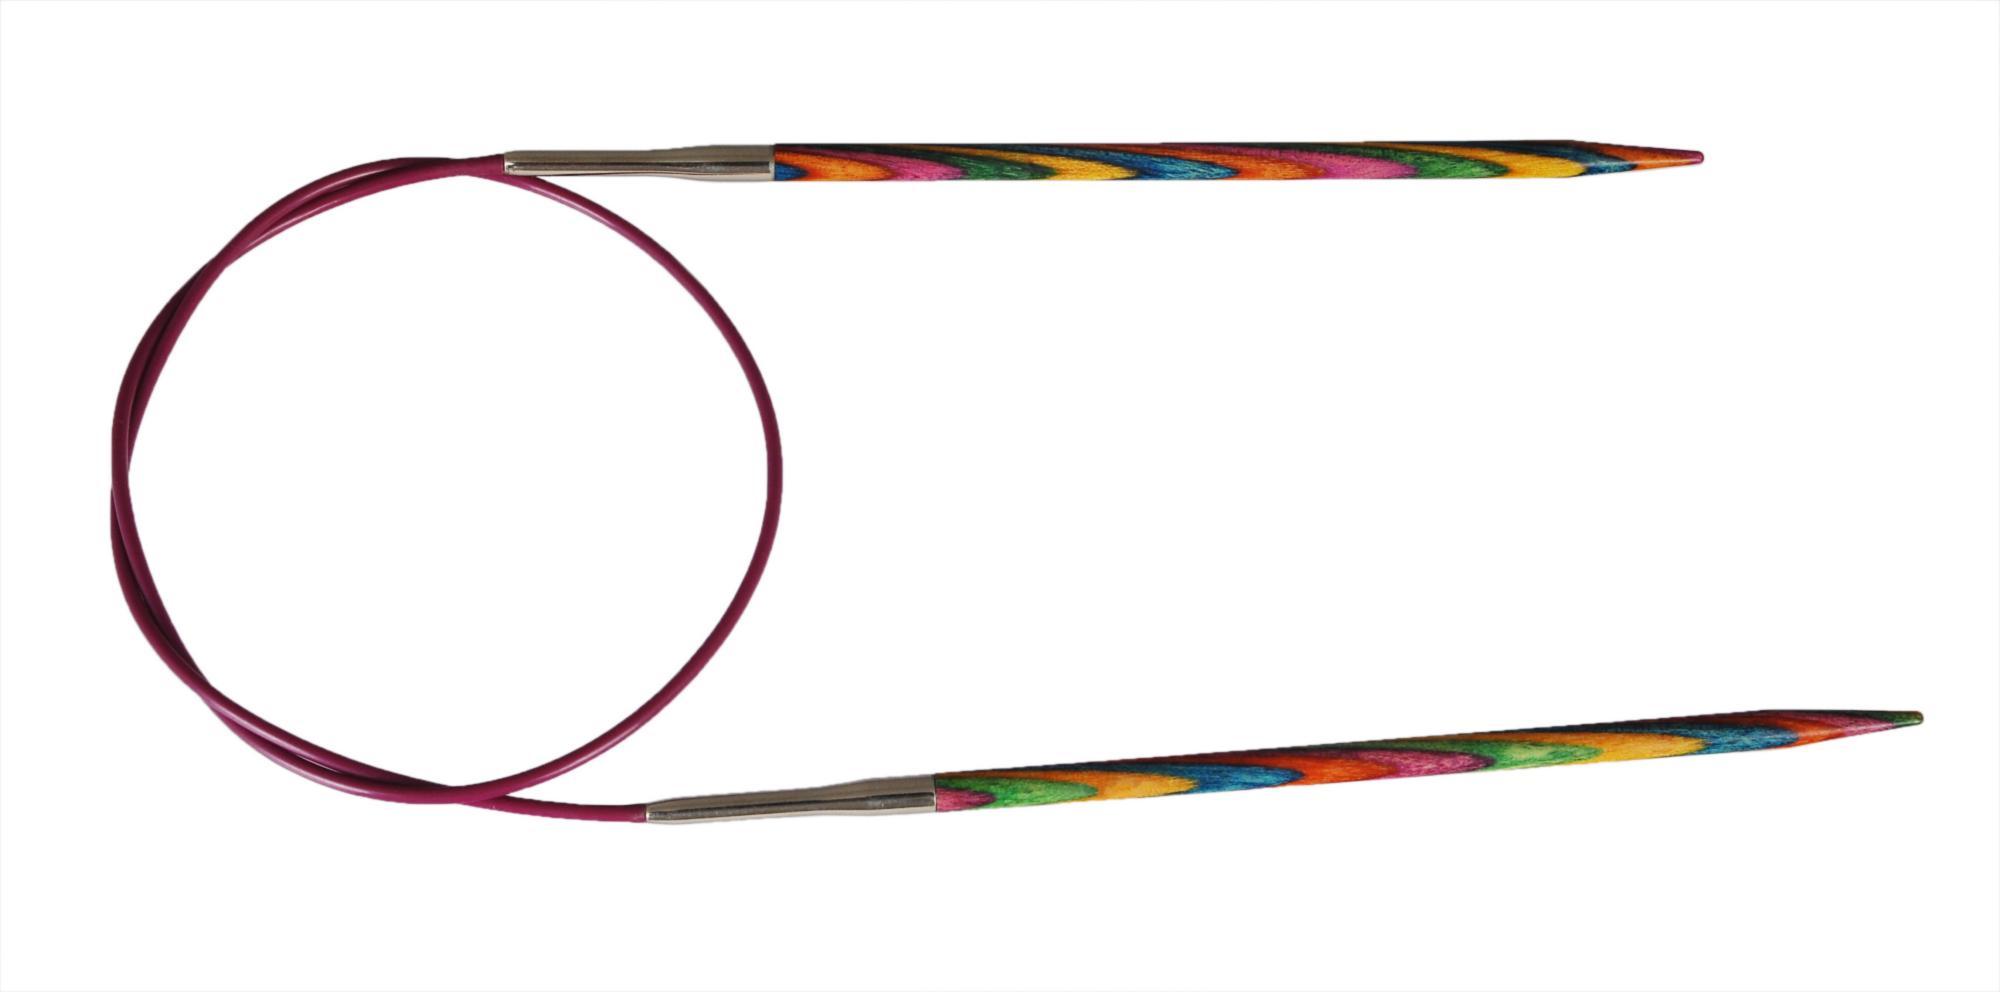 Спицы круговые 100 см Symfonie Wood KnitPro, 21350, 3.50 мм